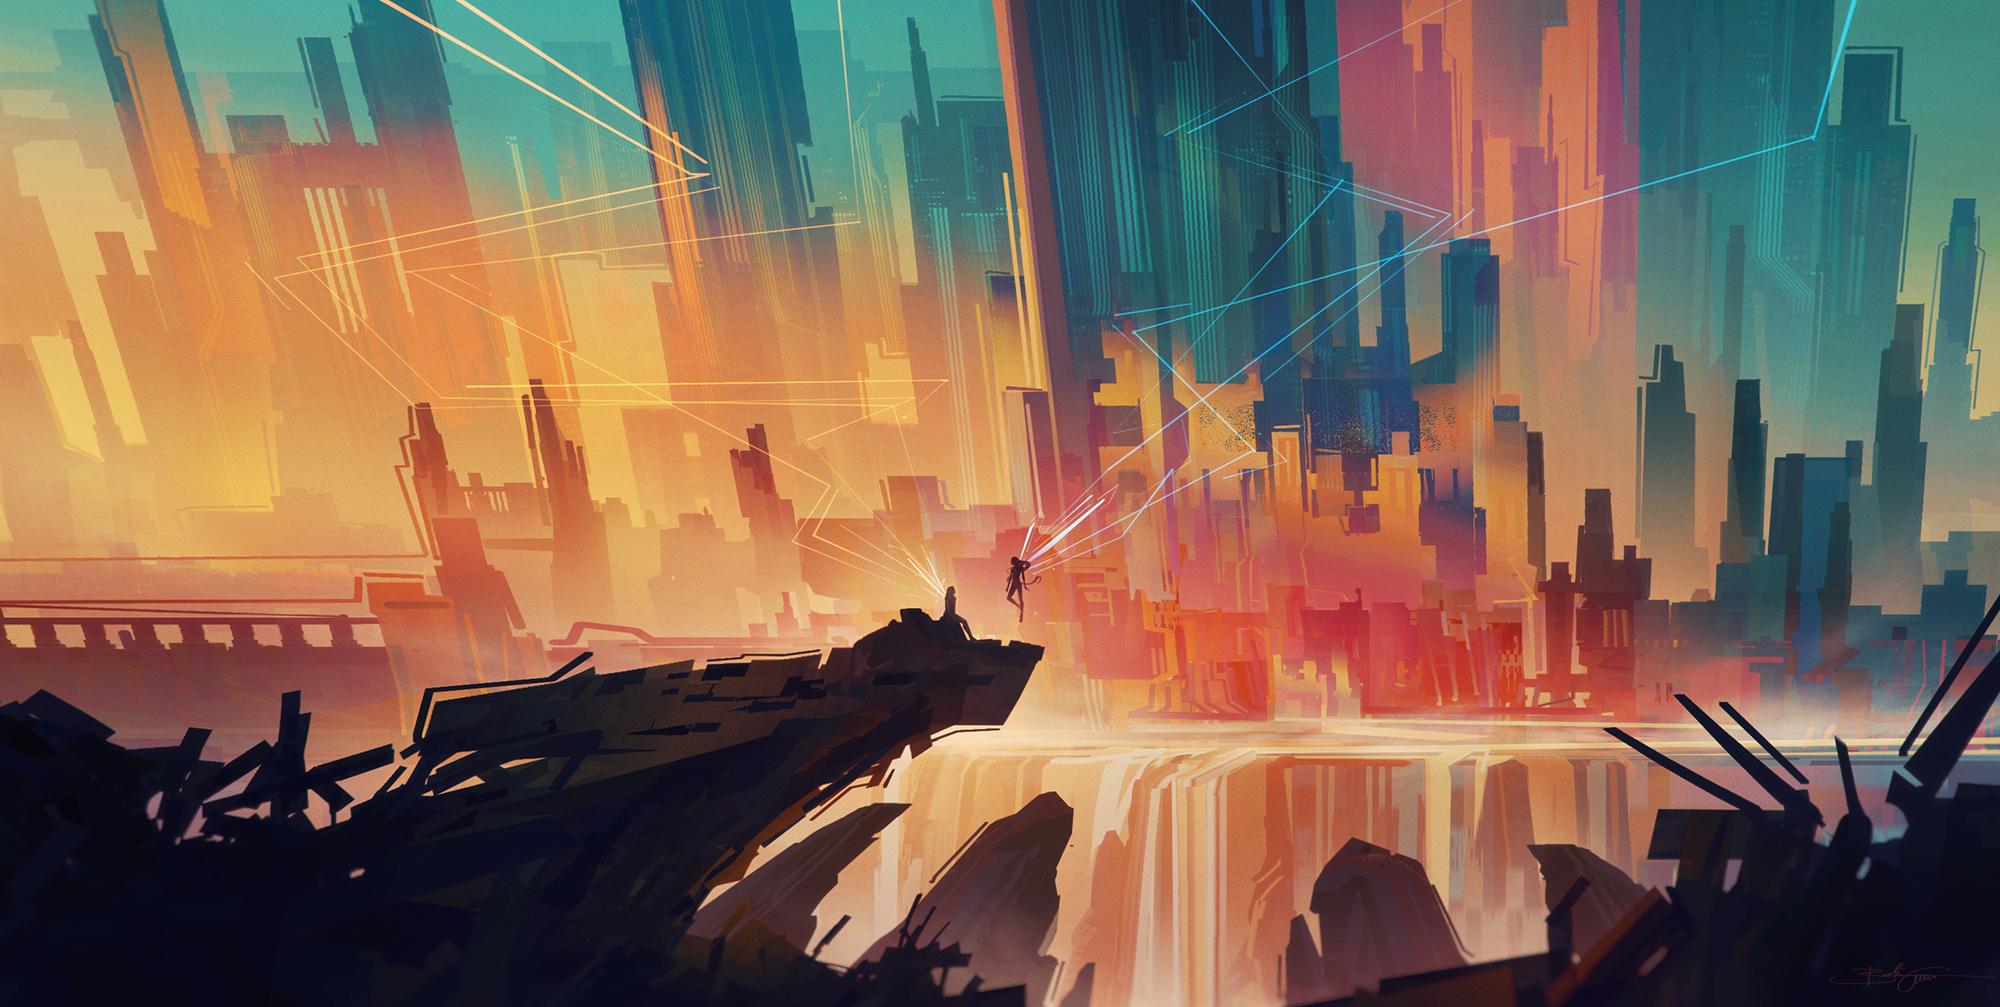 General 2000x1007 Bastien Grivet cityscape angel abstract artwork digital art DeviantArt